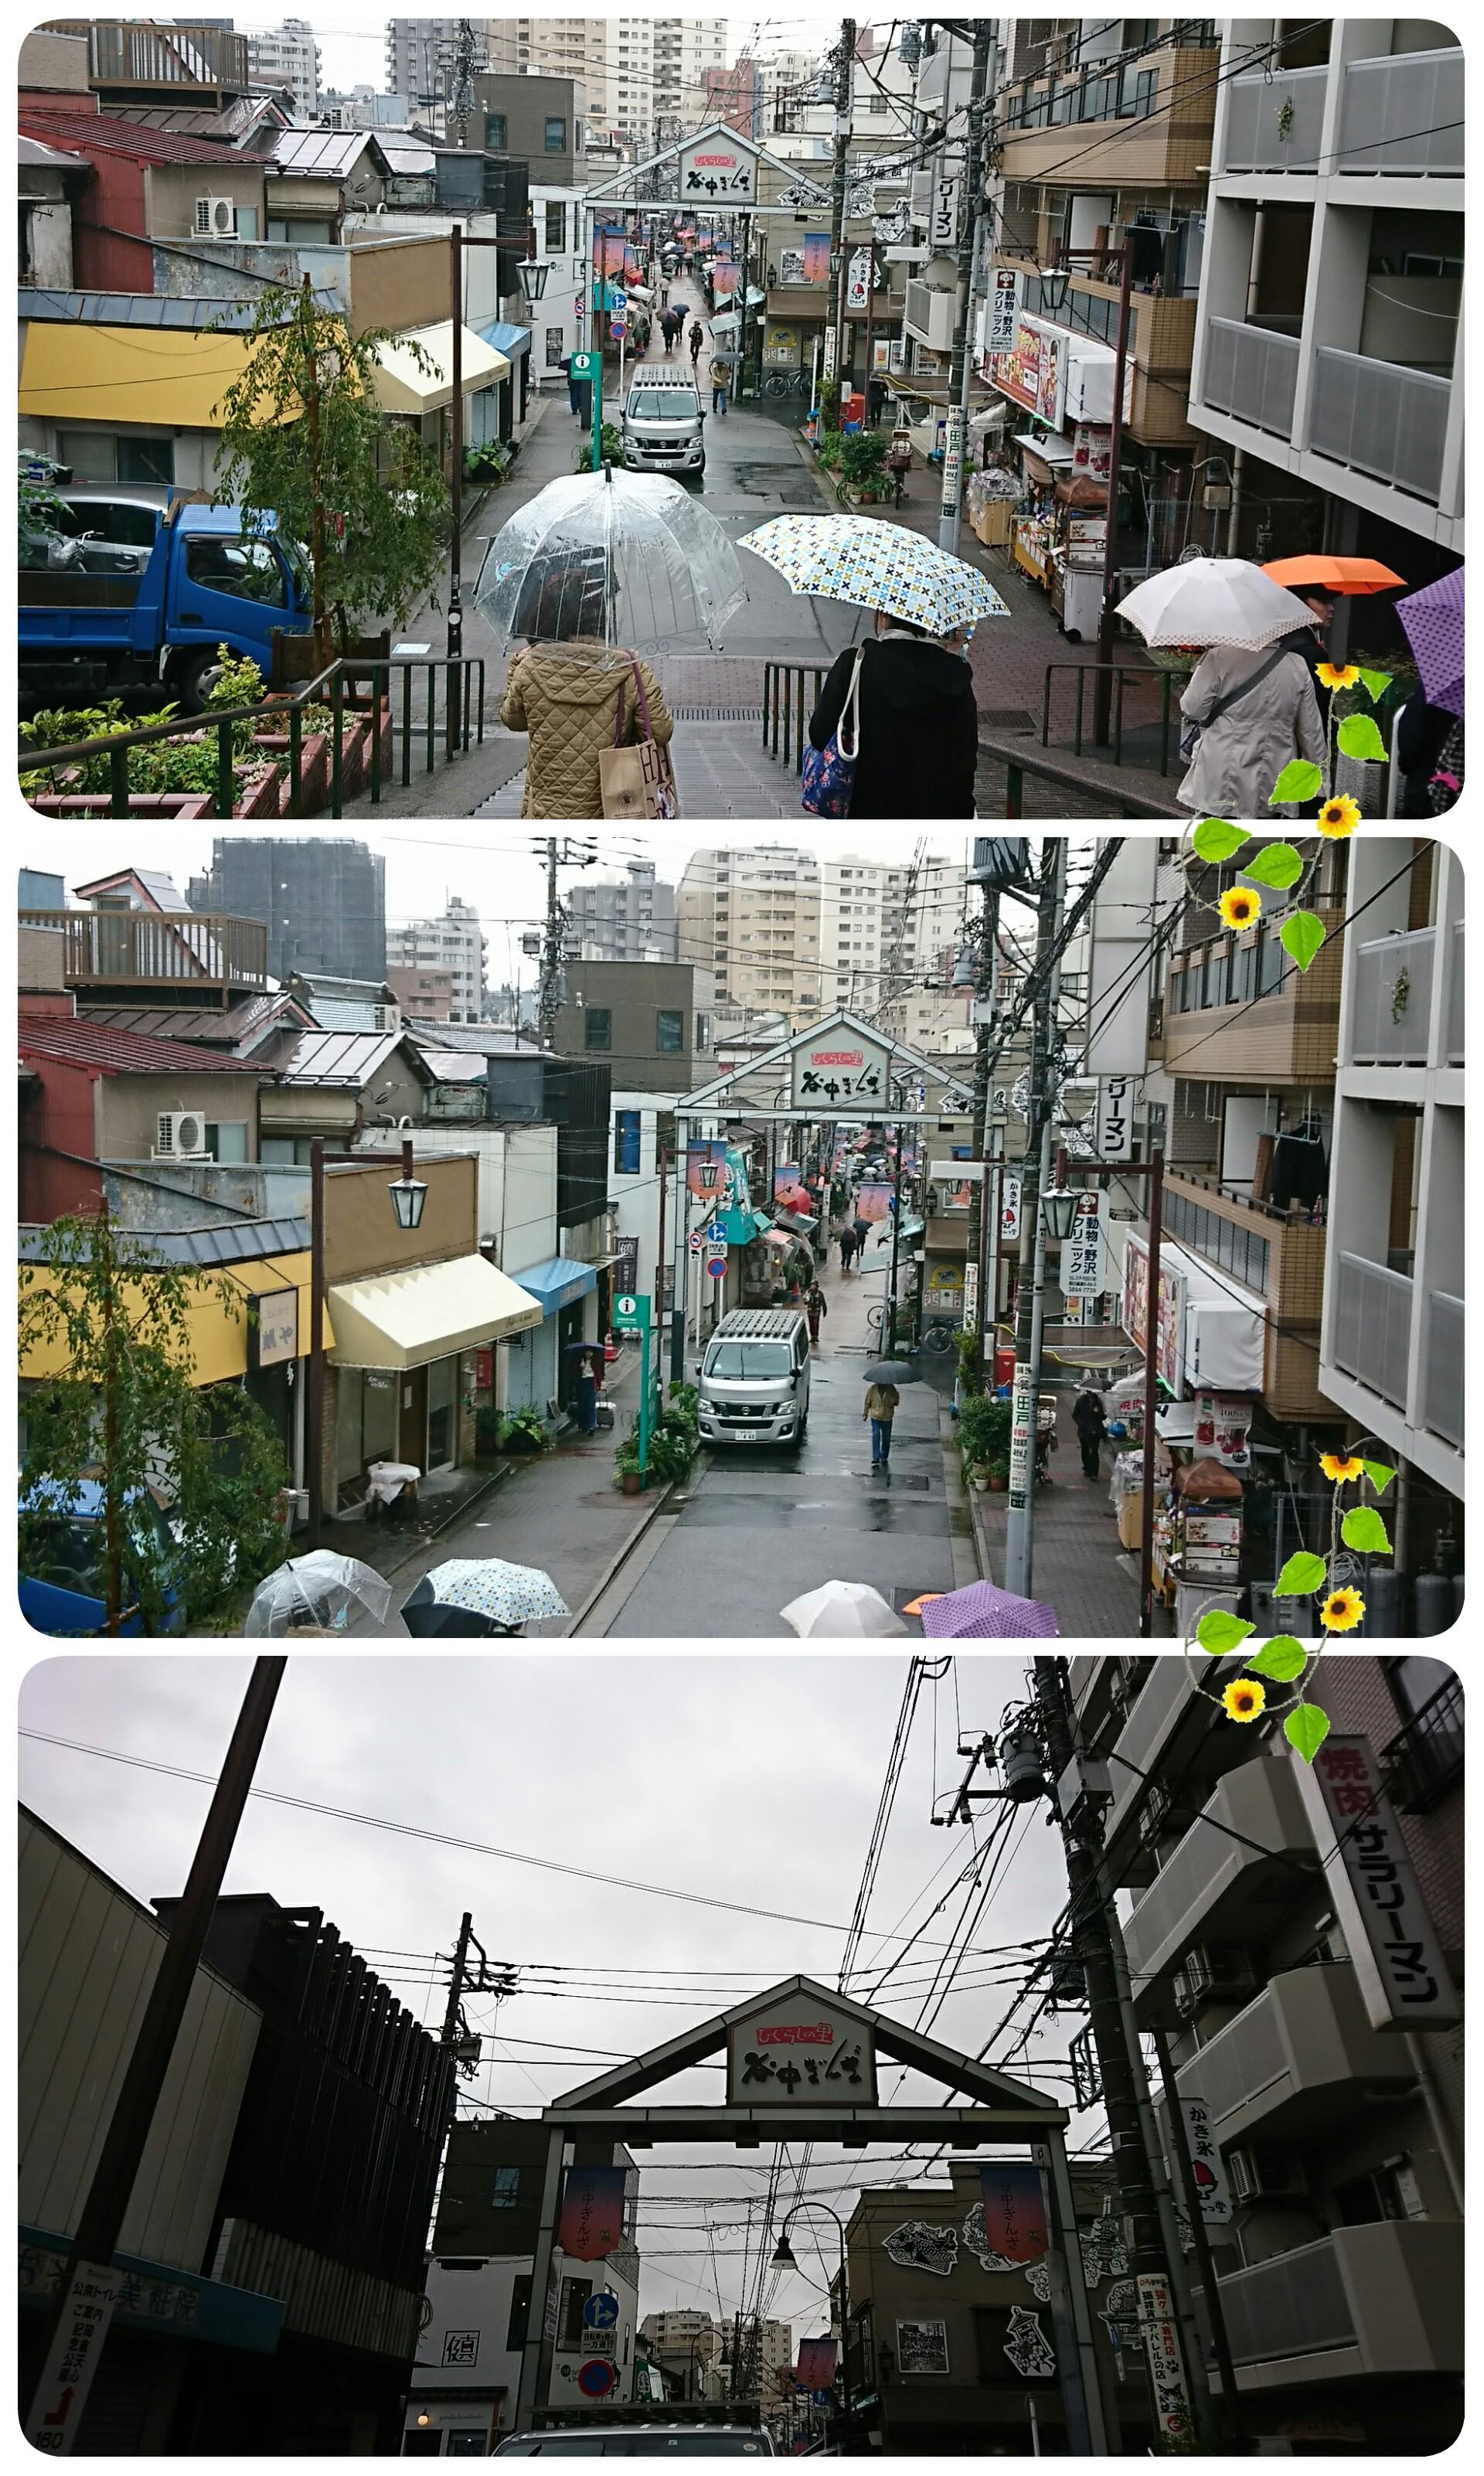 f:id:sunflower-shigeaki:20171020222924j:image